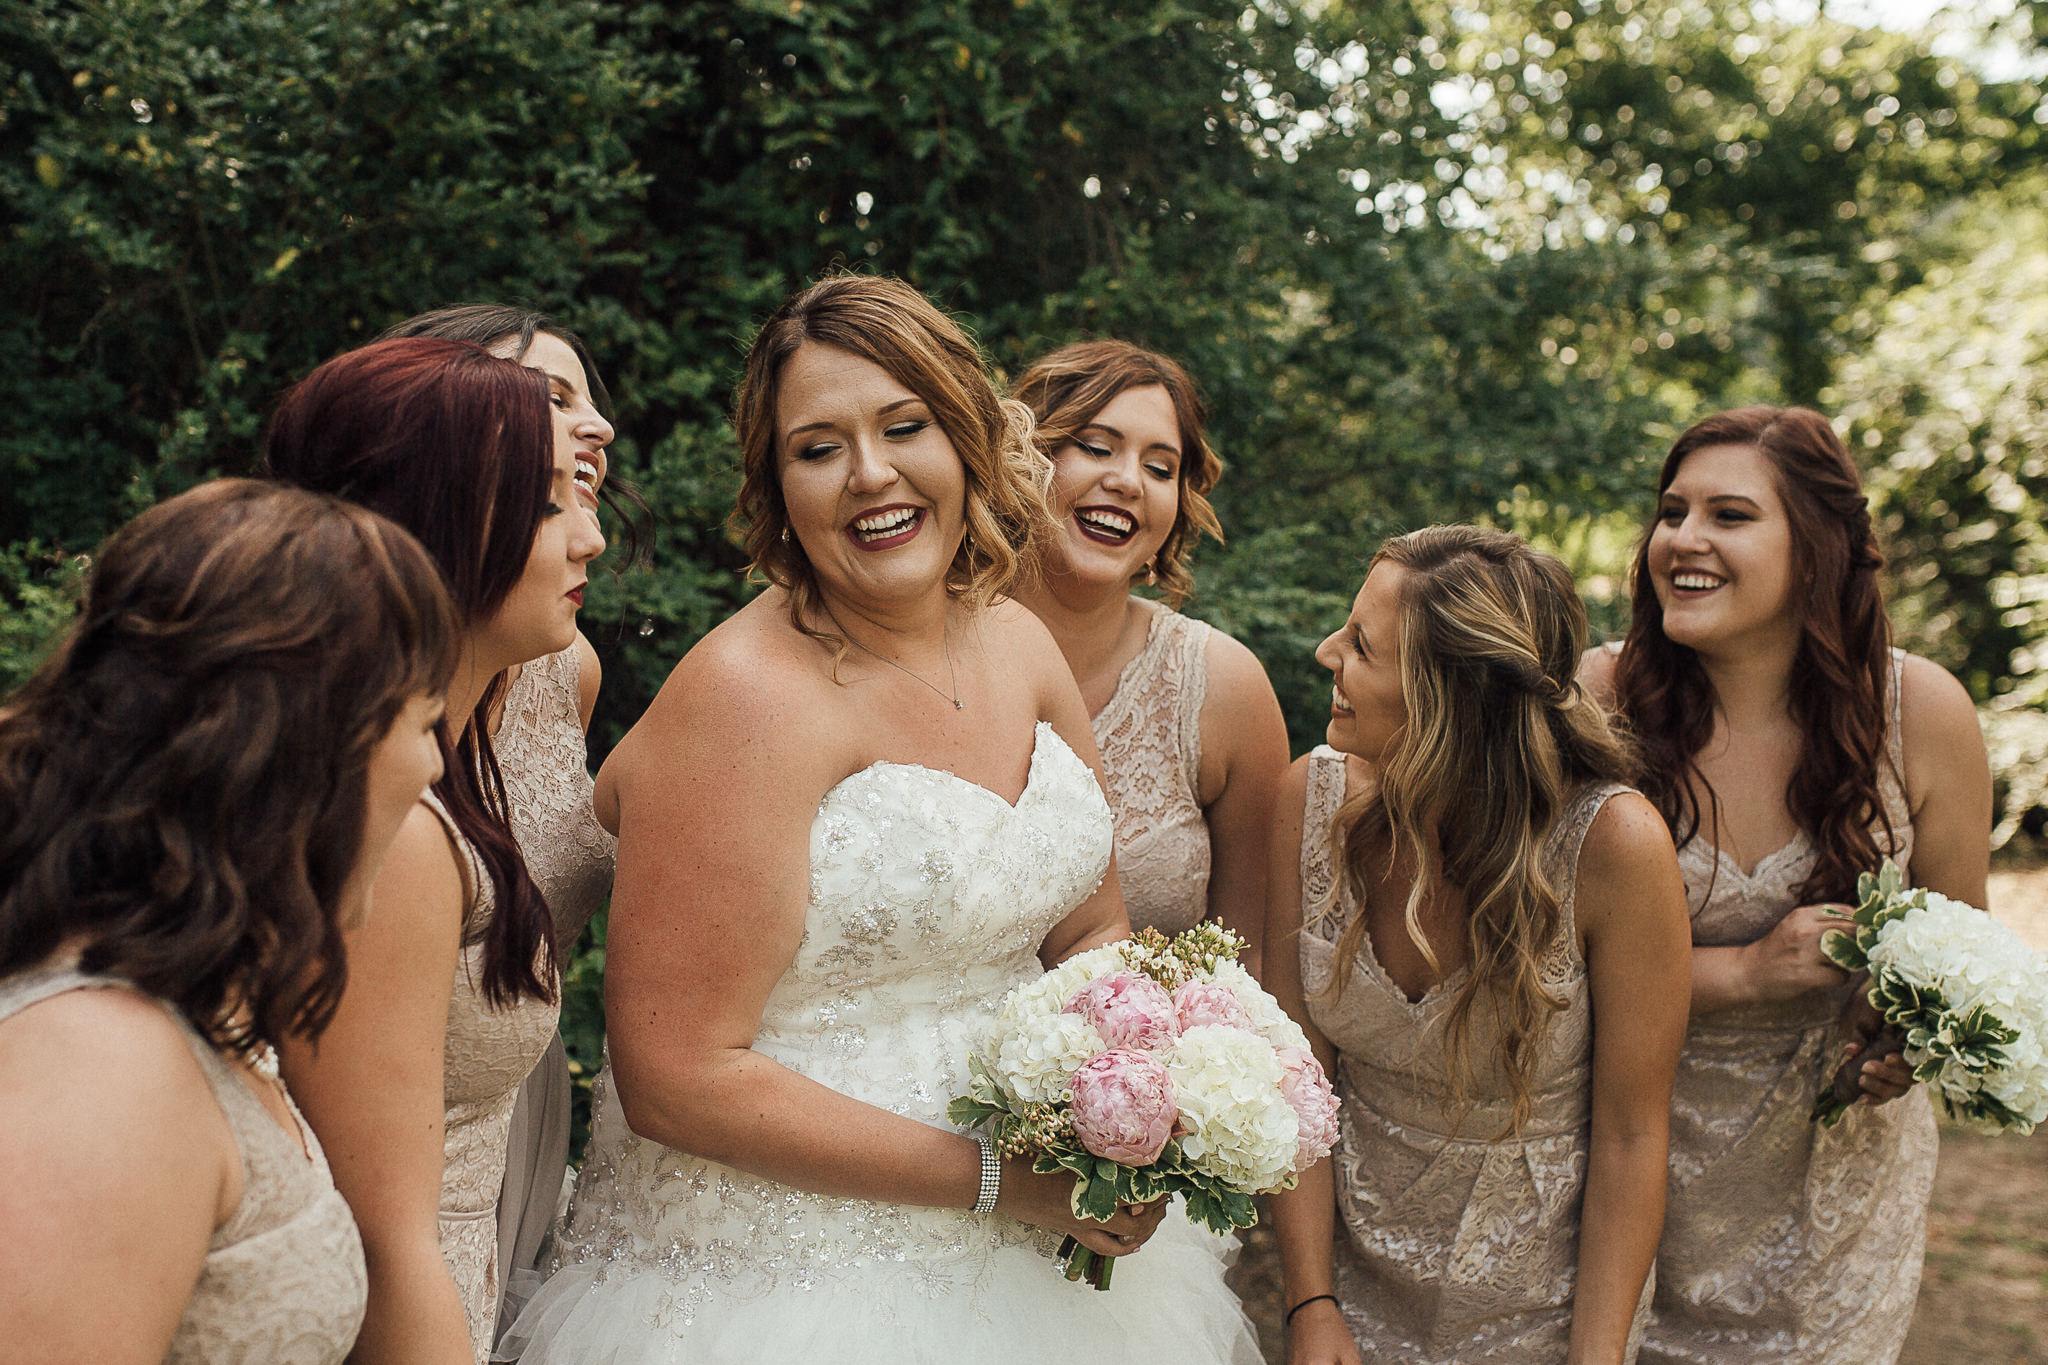 cassie-cook-photography-memphis-wedding-photographer-62.jpg